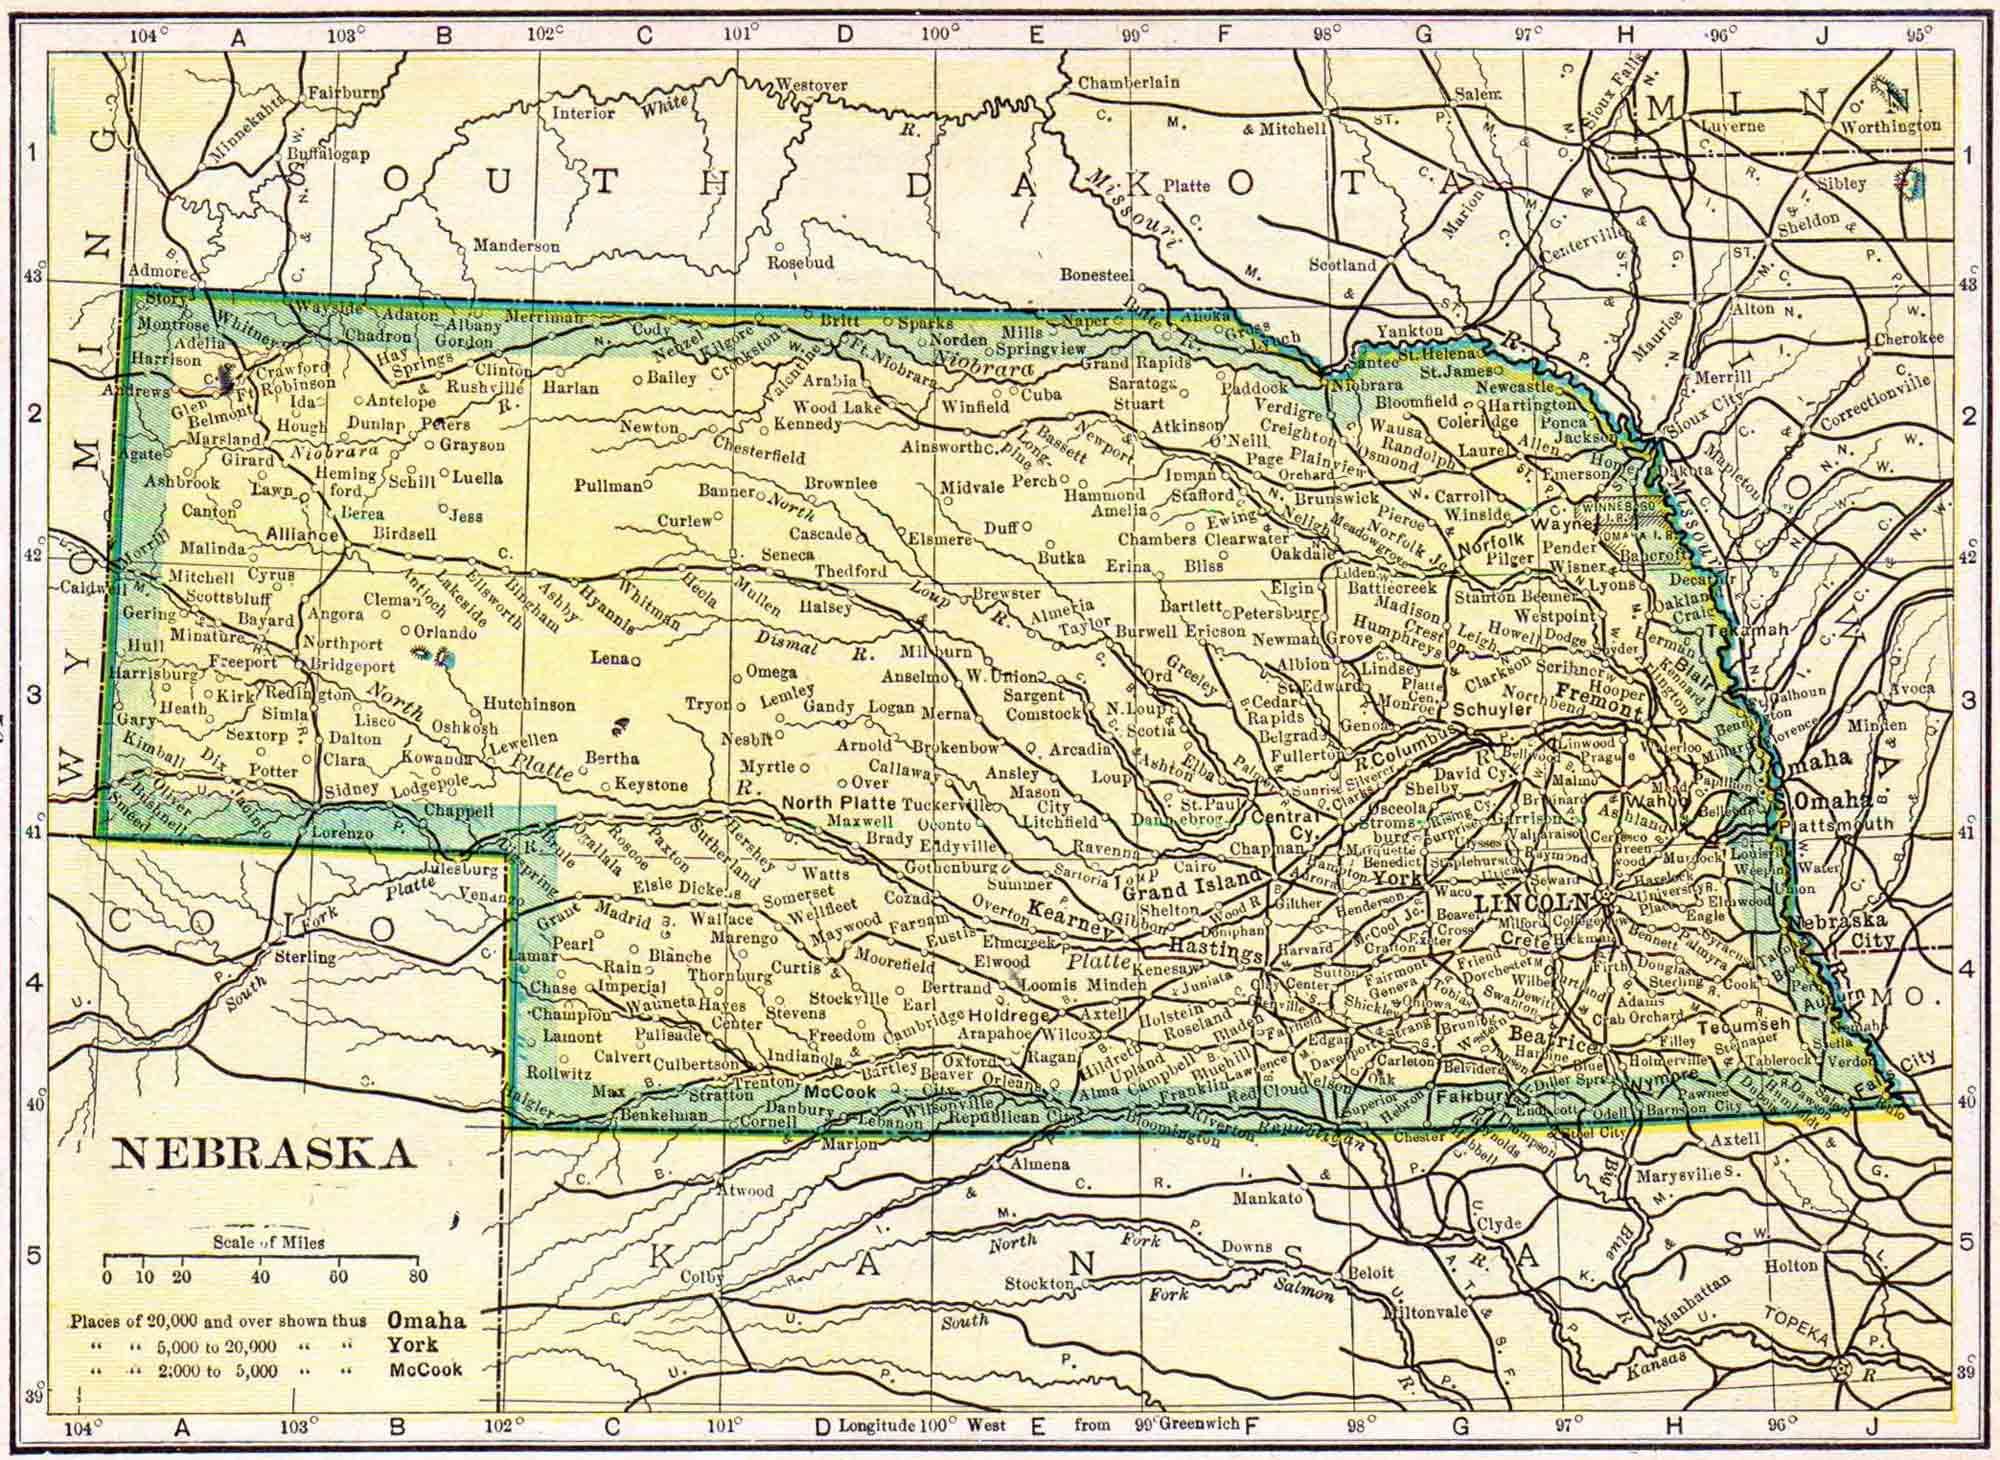 1910 Nebraska Census Map | Access Genealogy